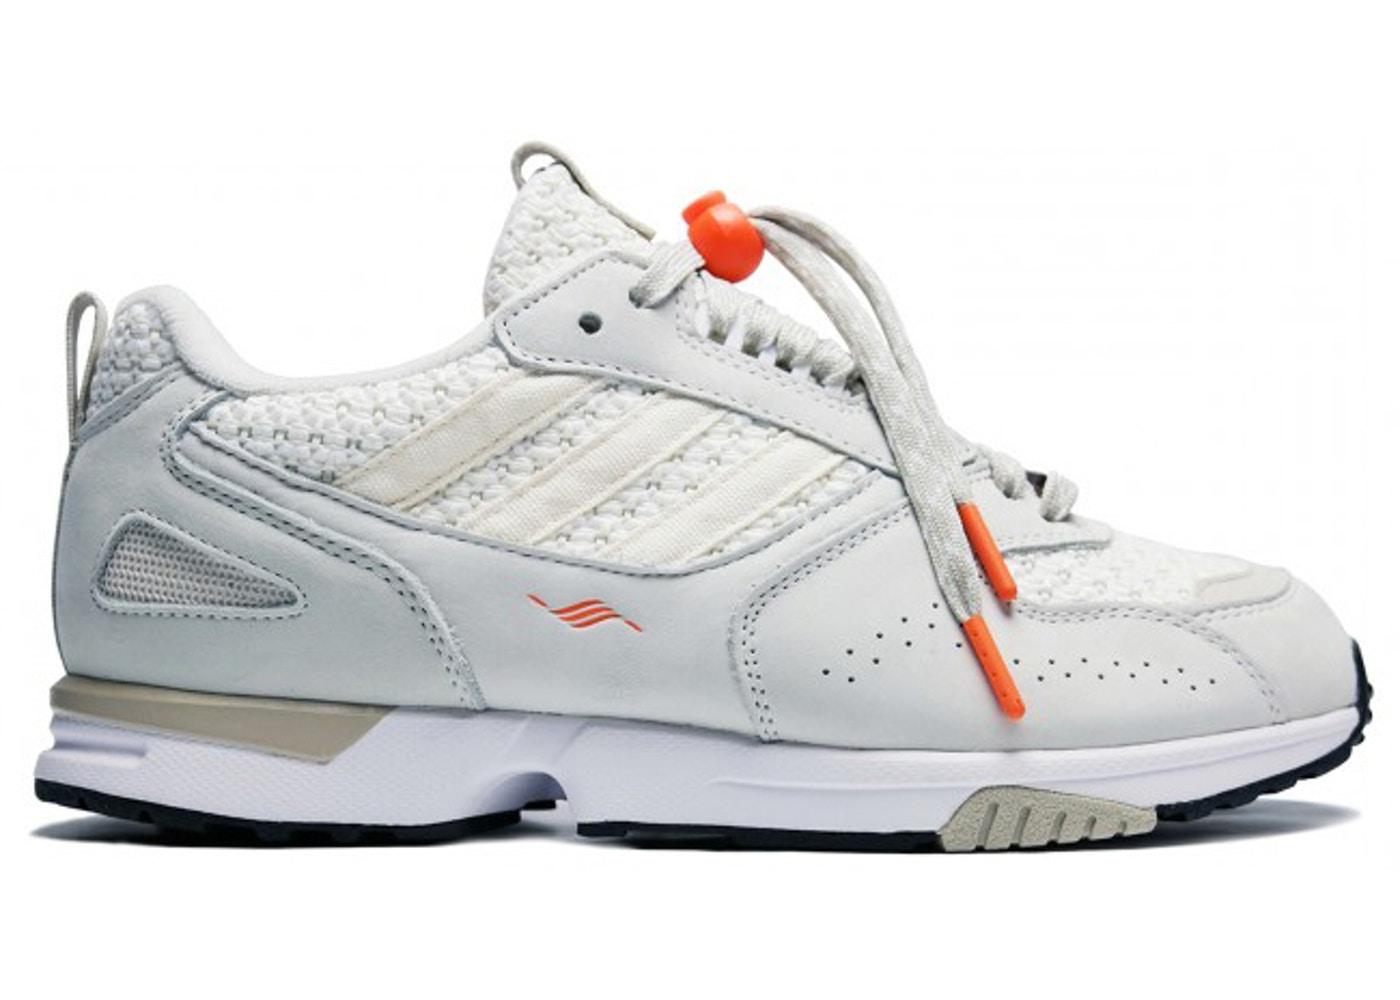 wholesale dealer e8aab 5ffb9 Now Available  Shelflife x adidas Consortium ZX4000 — Sneaker Shouts